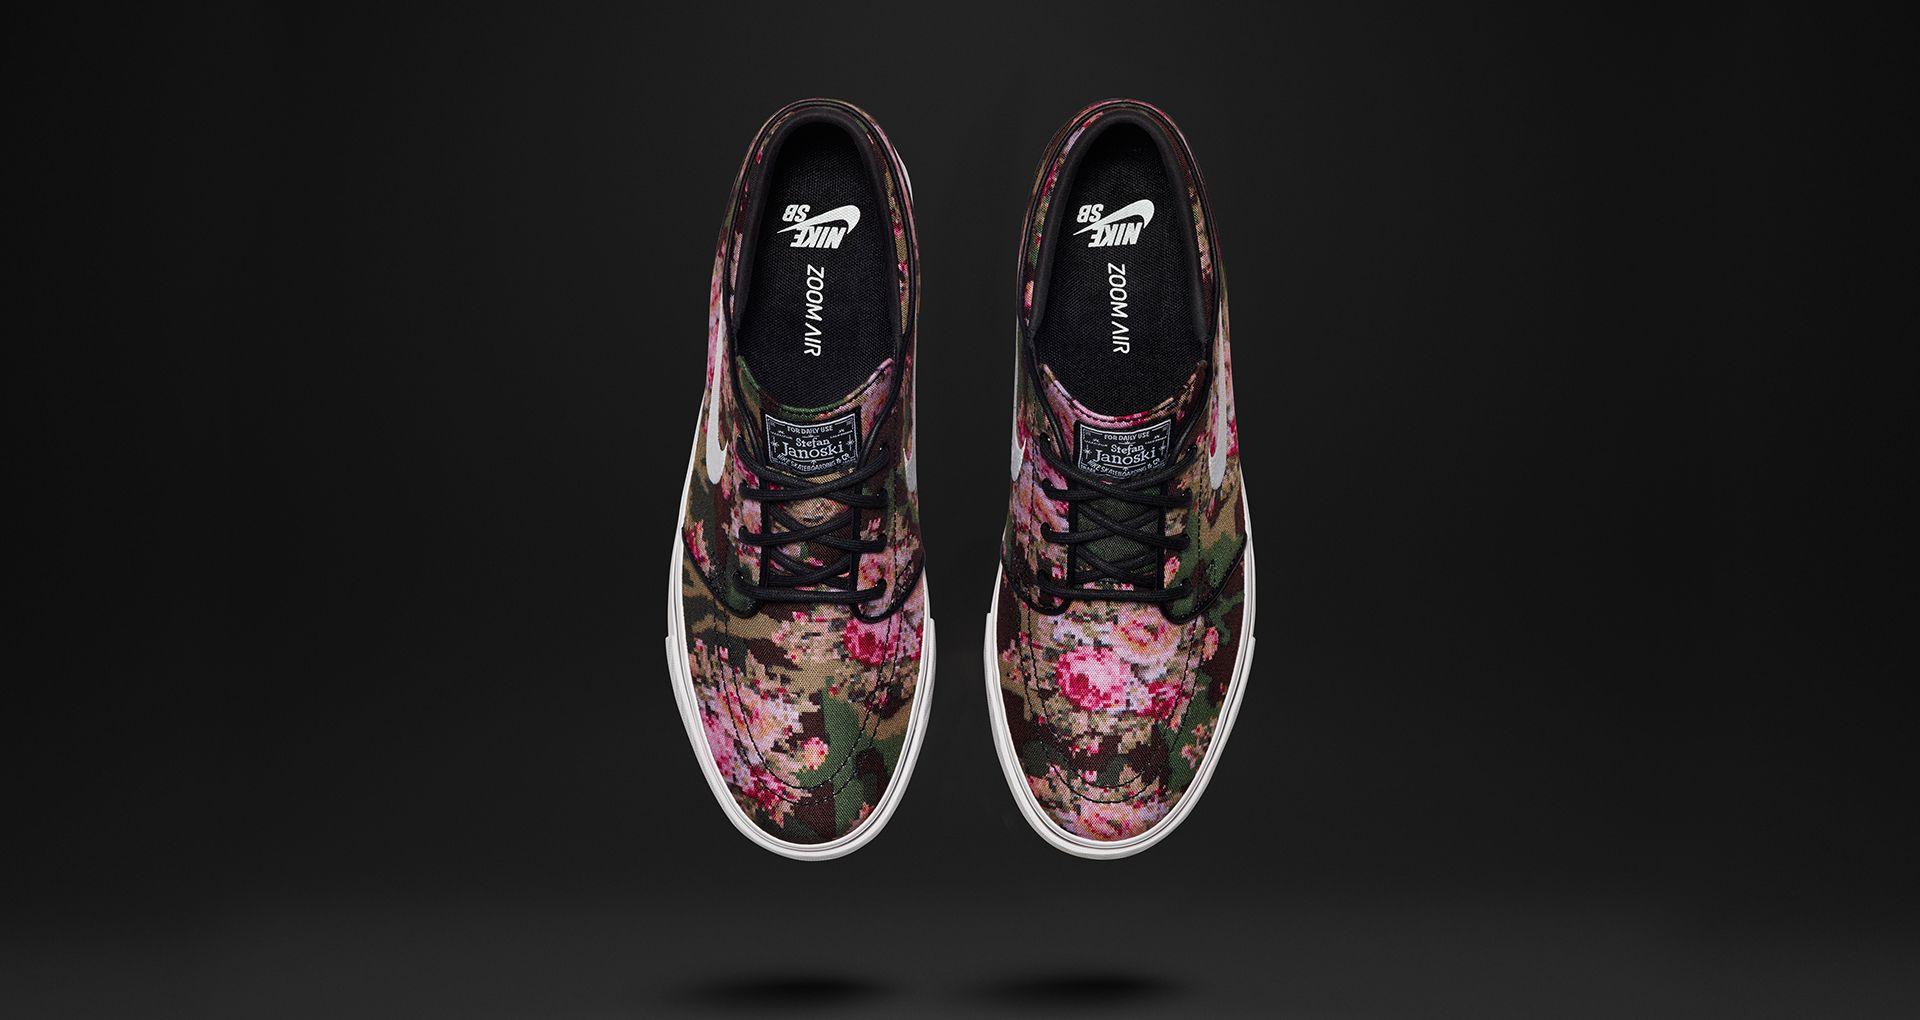 Nike Zoom Stefan Janoski 'Digi Floral'. Nike SNKRS